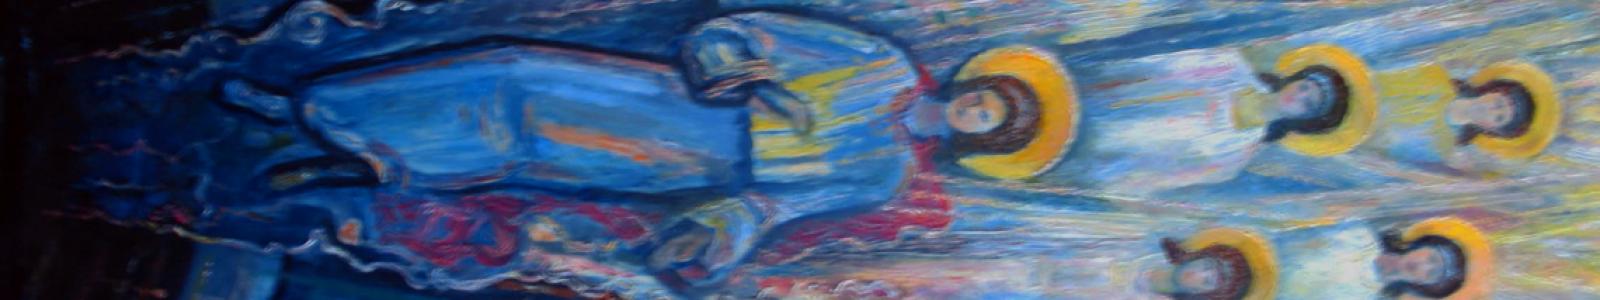 Gallery Painter Bogdan Zbryski